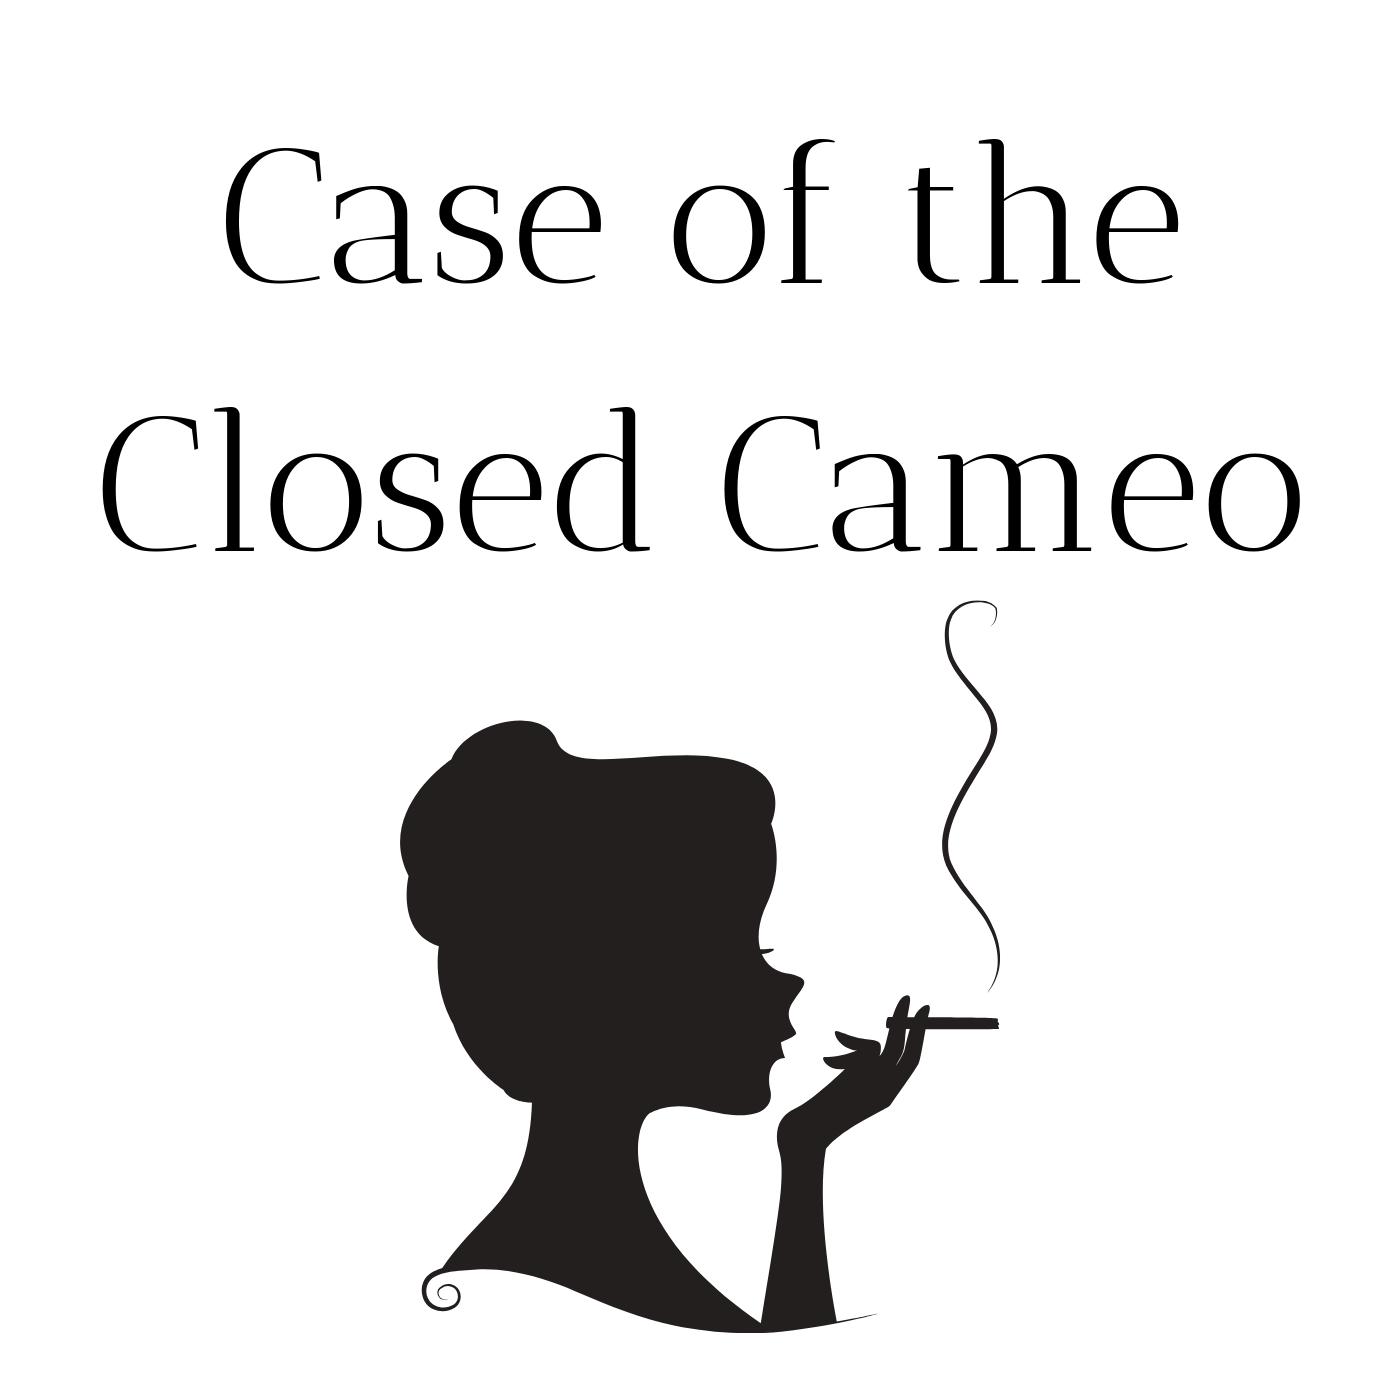 745 - The Case of the Closed Cameo   Big Farm in the Sky P.I. S2 E2